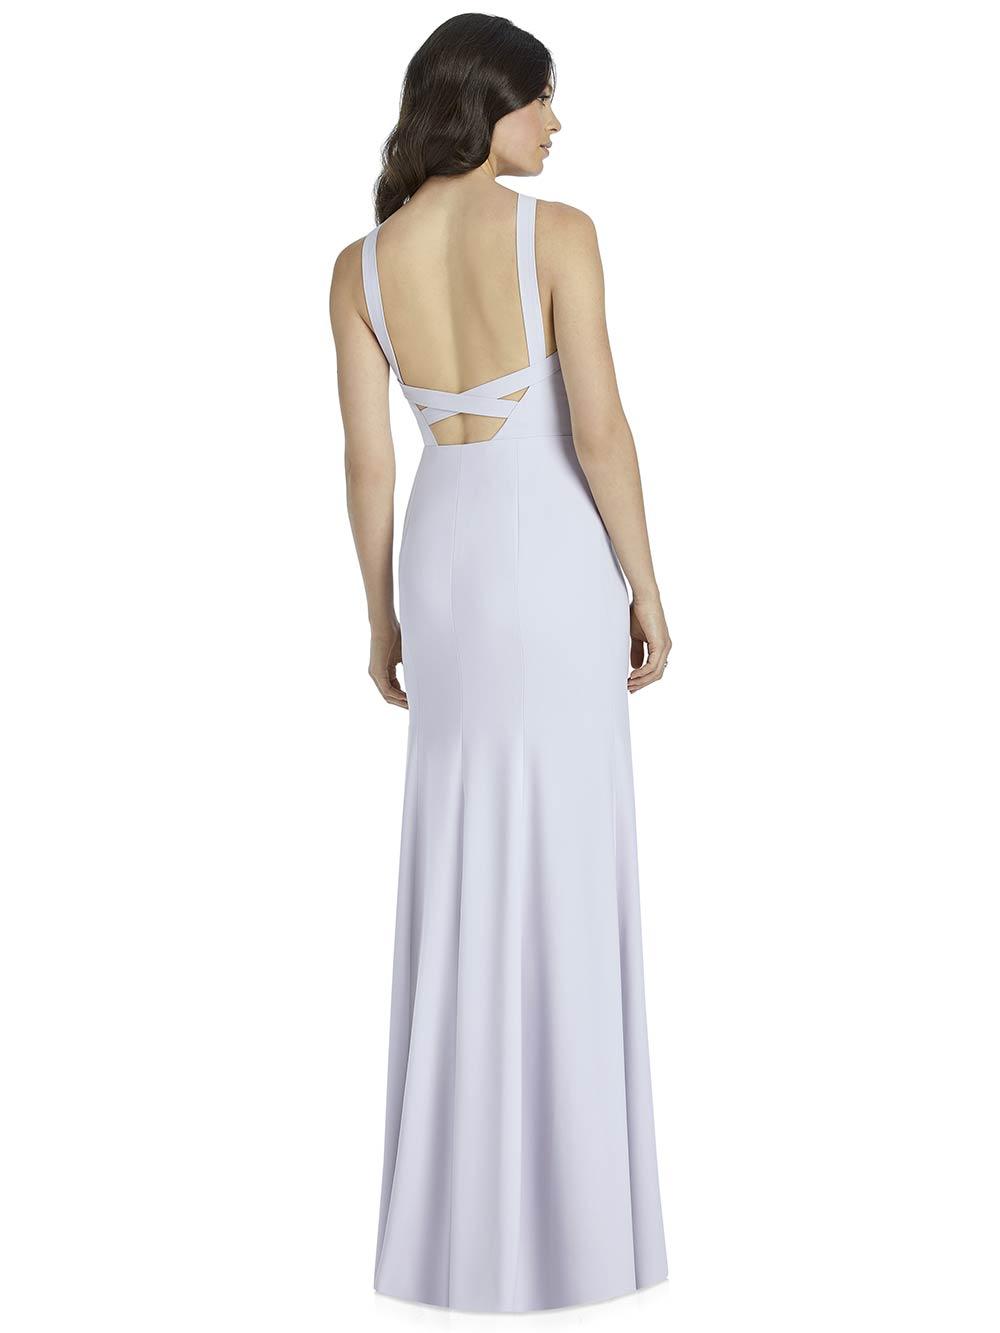 bridesmaid-dresses-dessy-27131